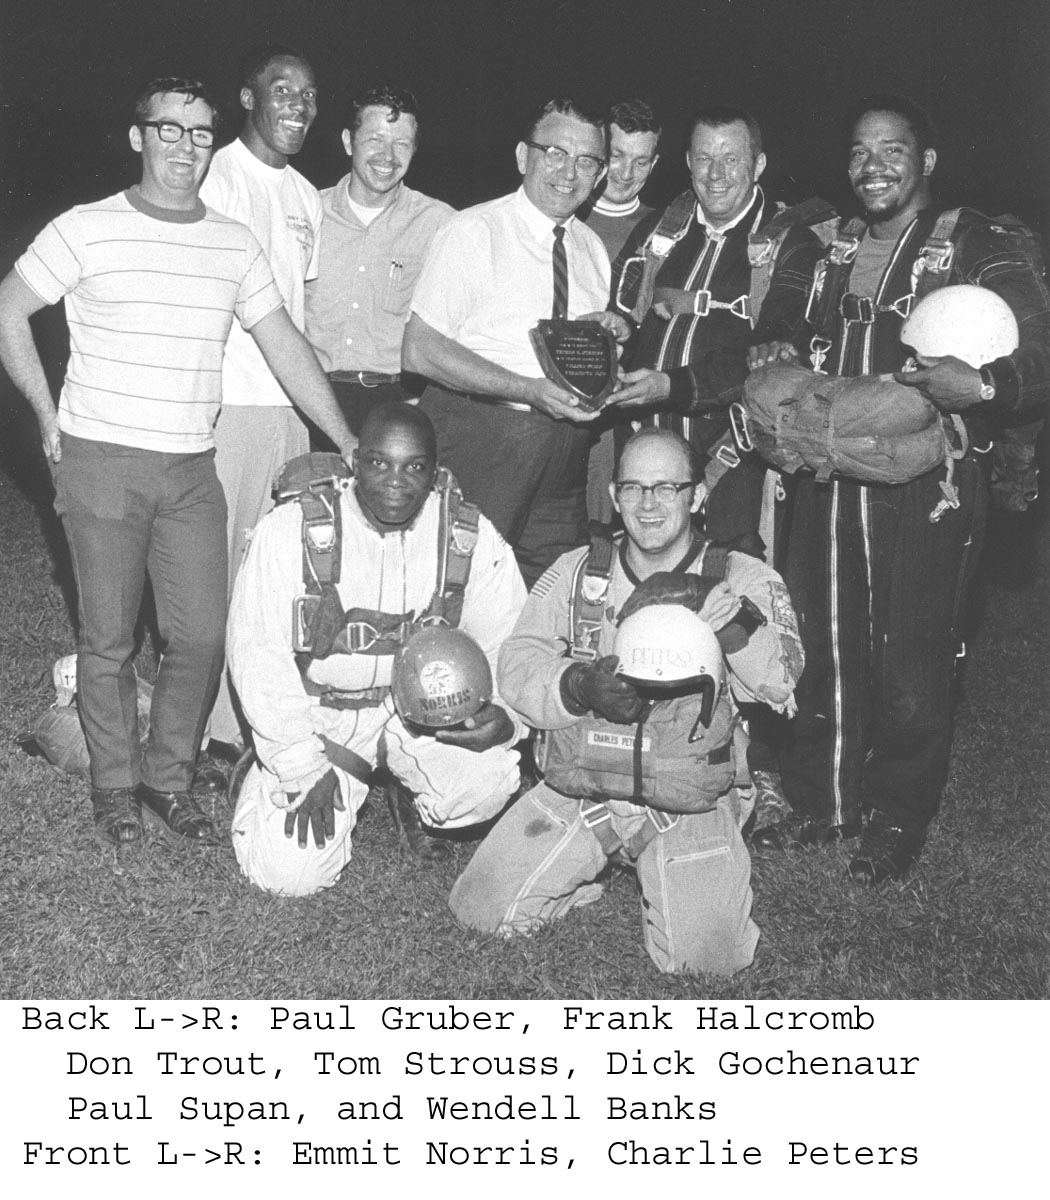 History of maytown sport parachute club